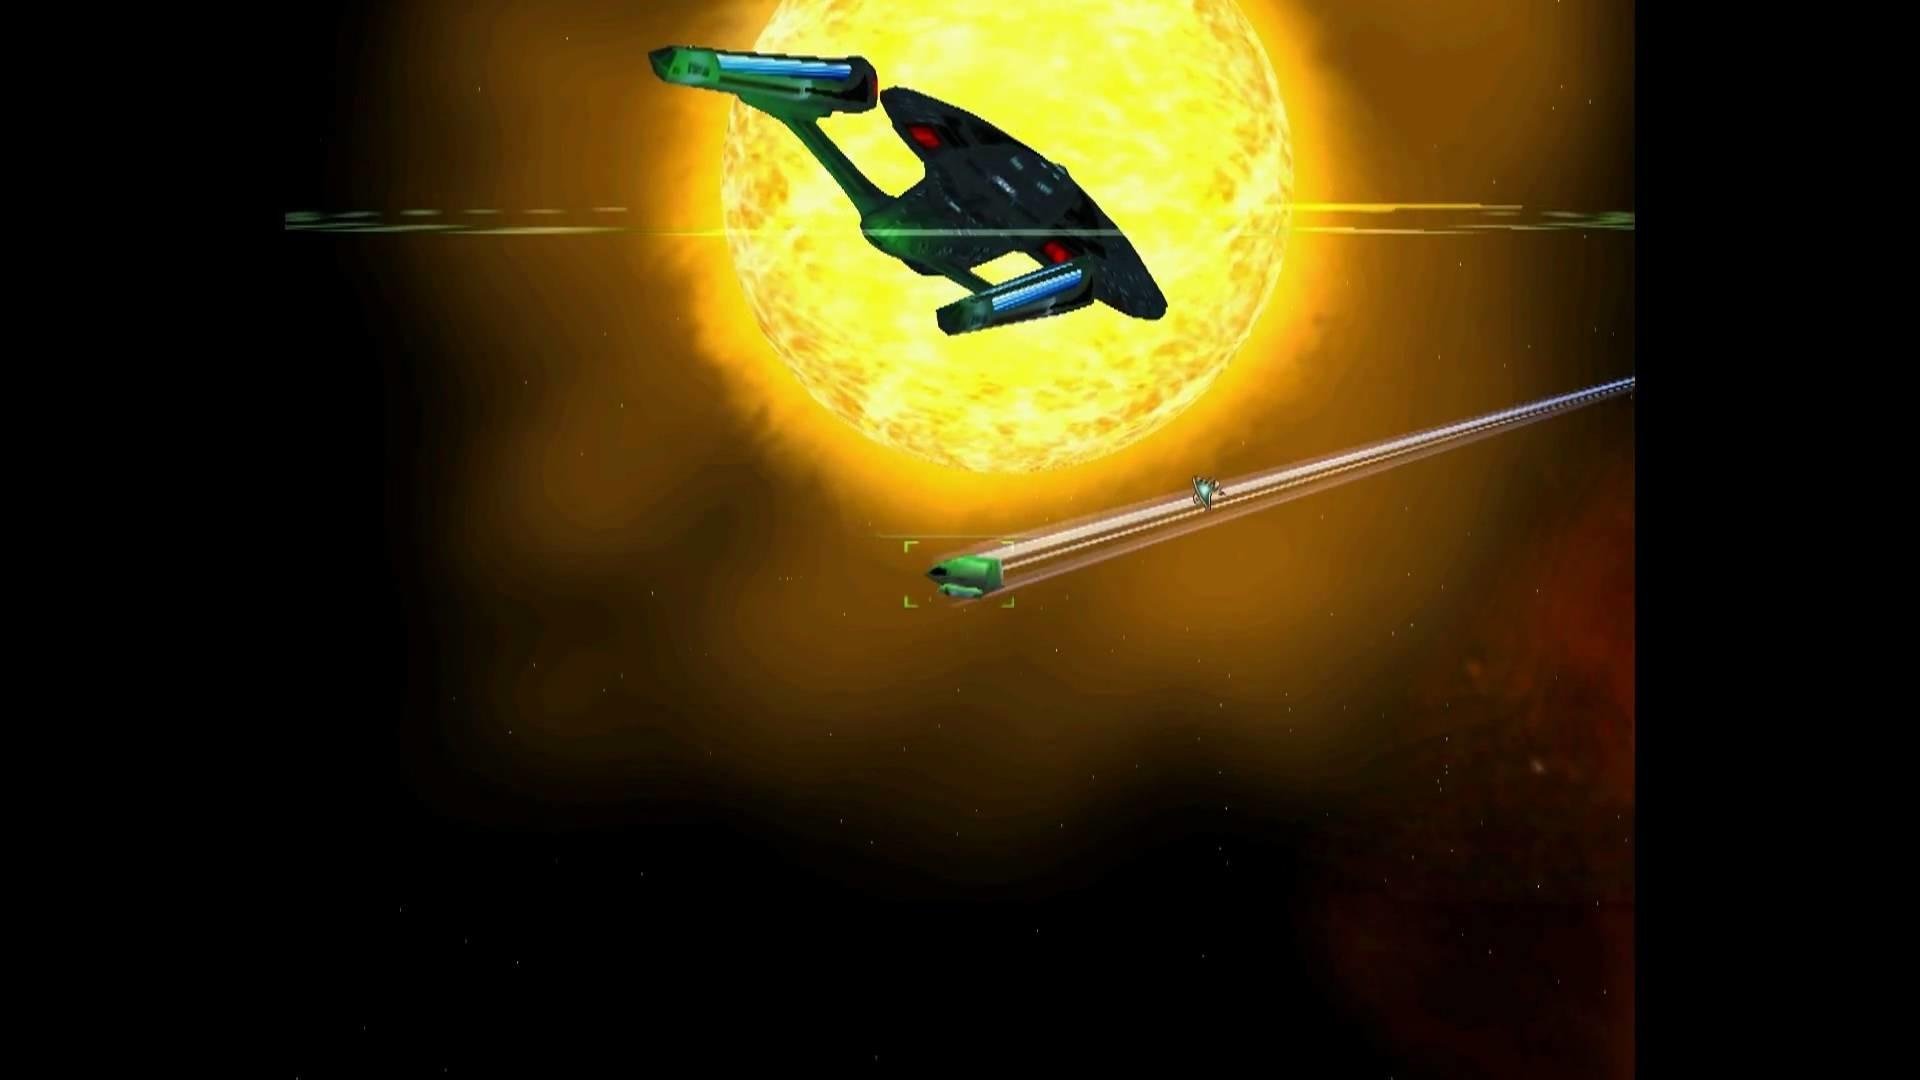 star trek starfleet command 3 Generations at war mod